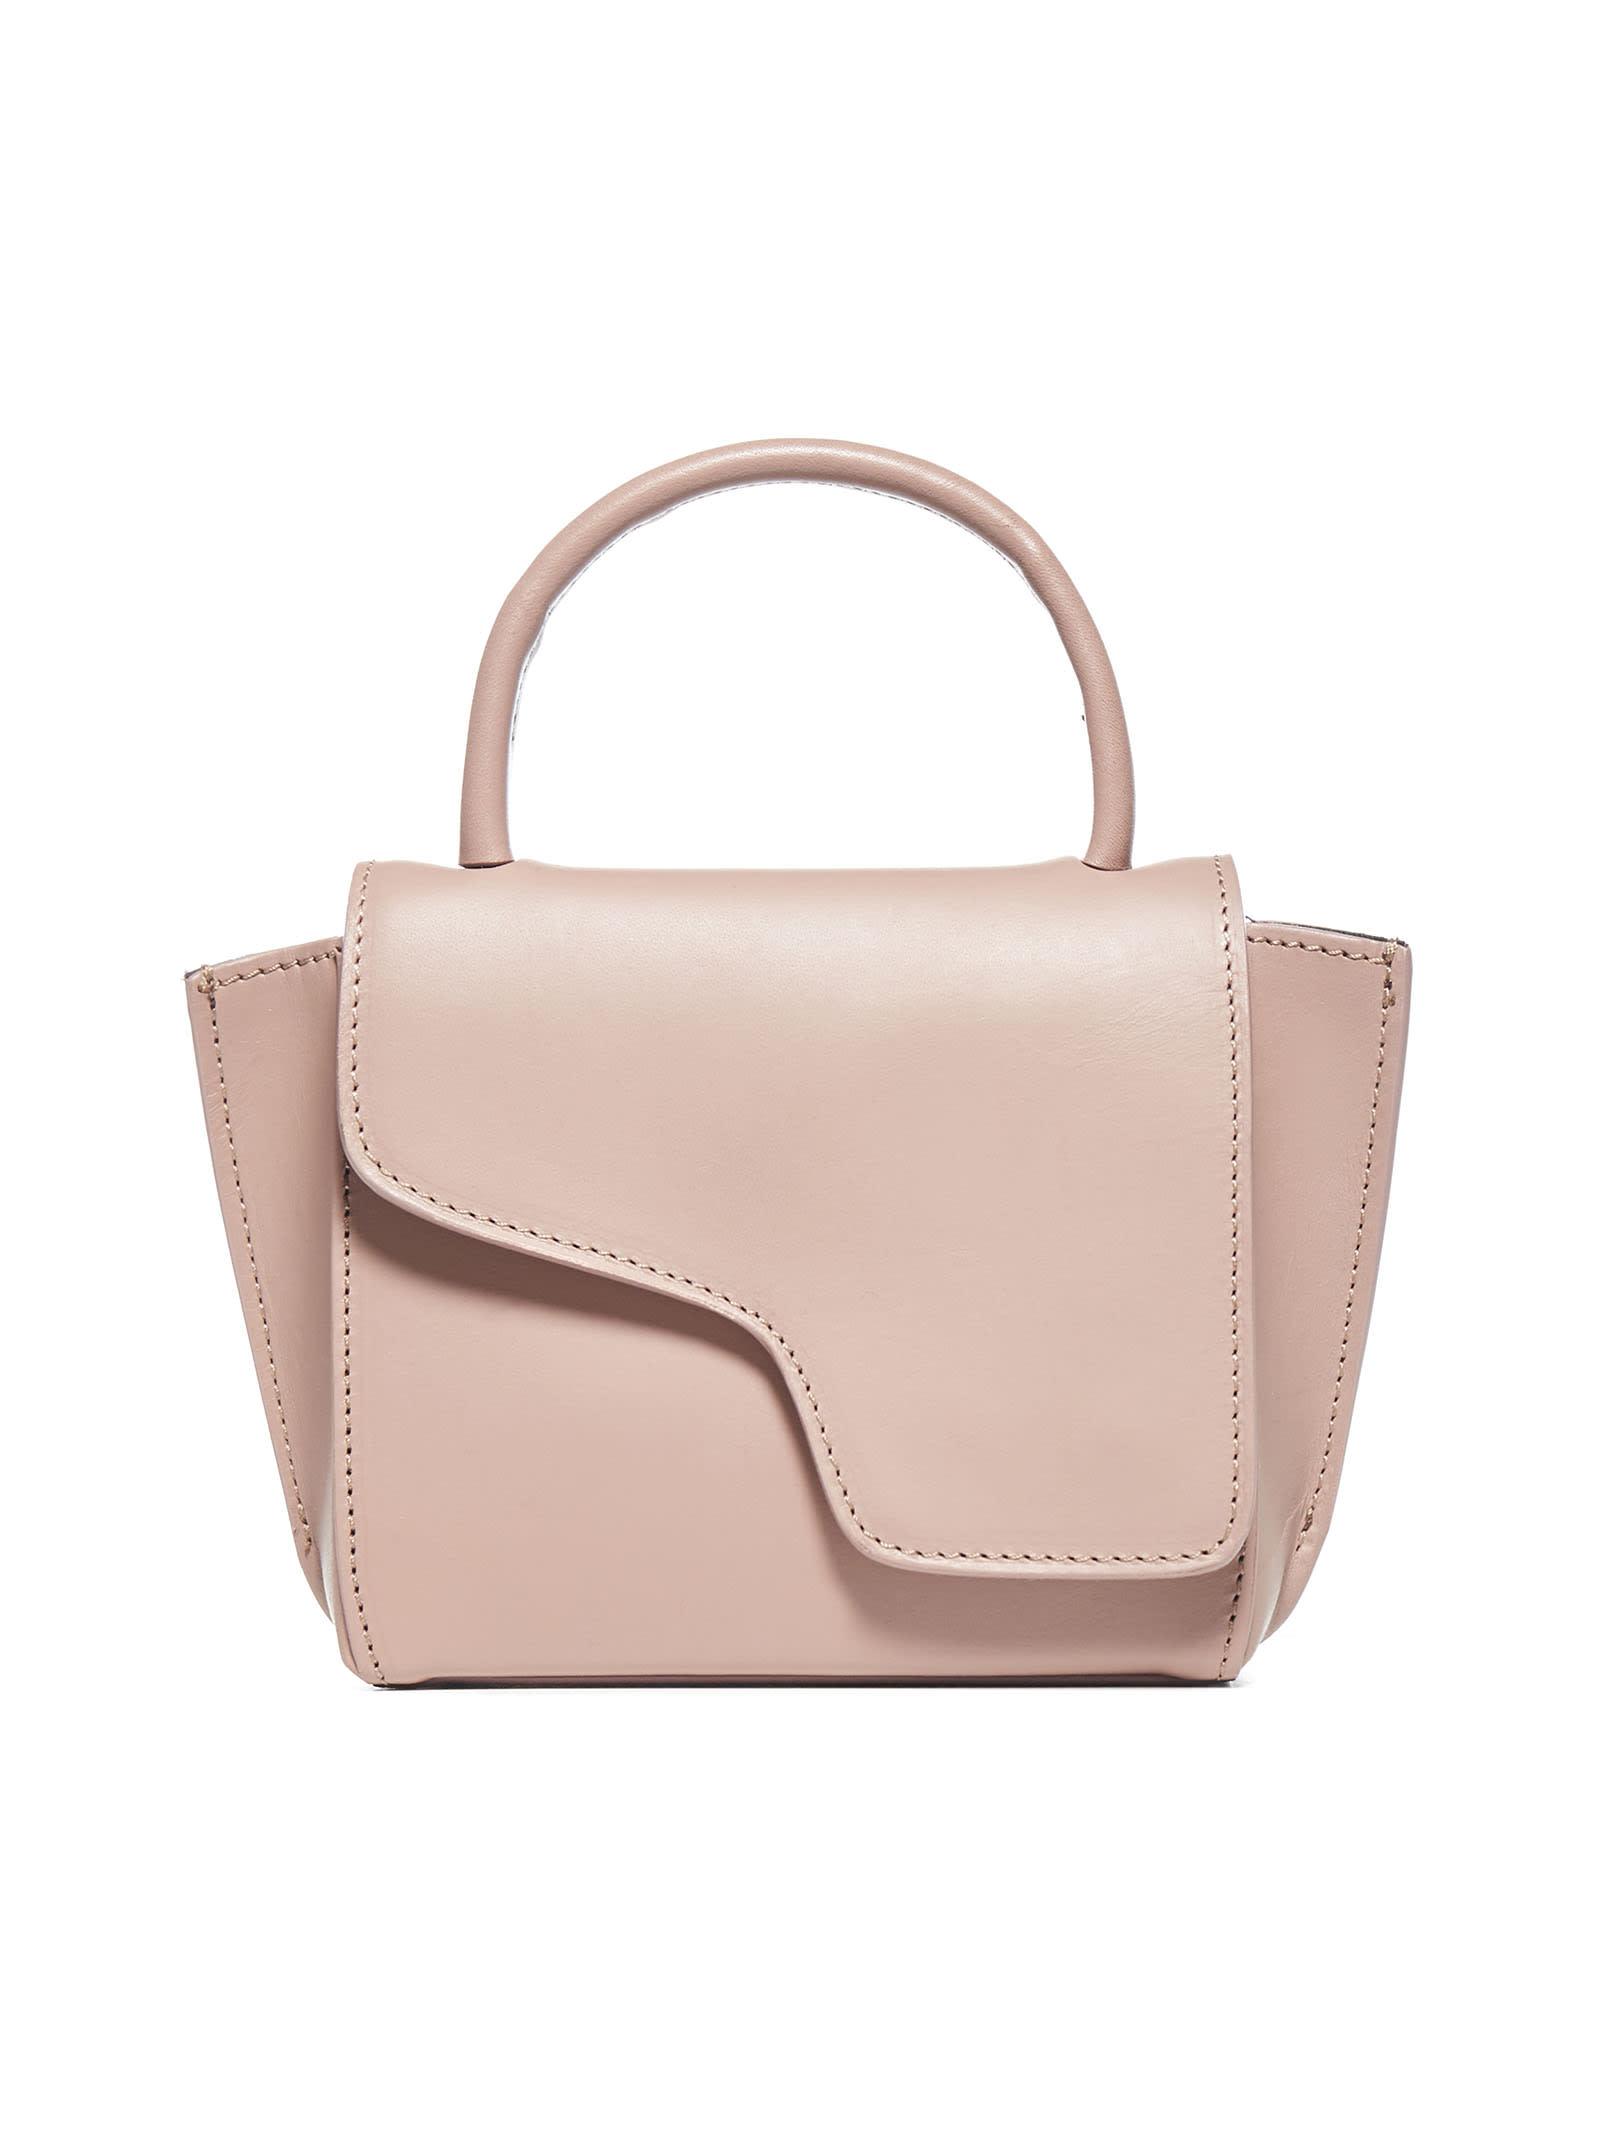 Atp Atelier Montalcino Mini Calfskin Bag In Khaki Rose